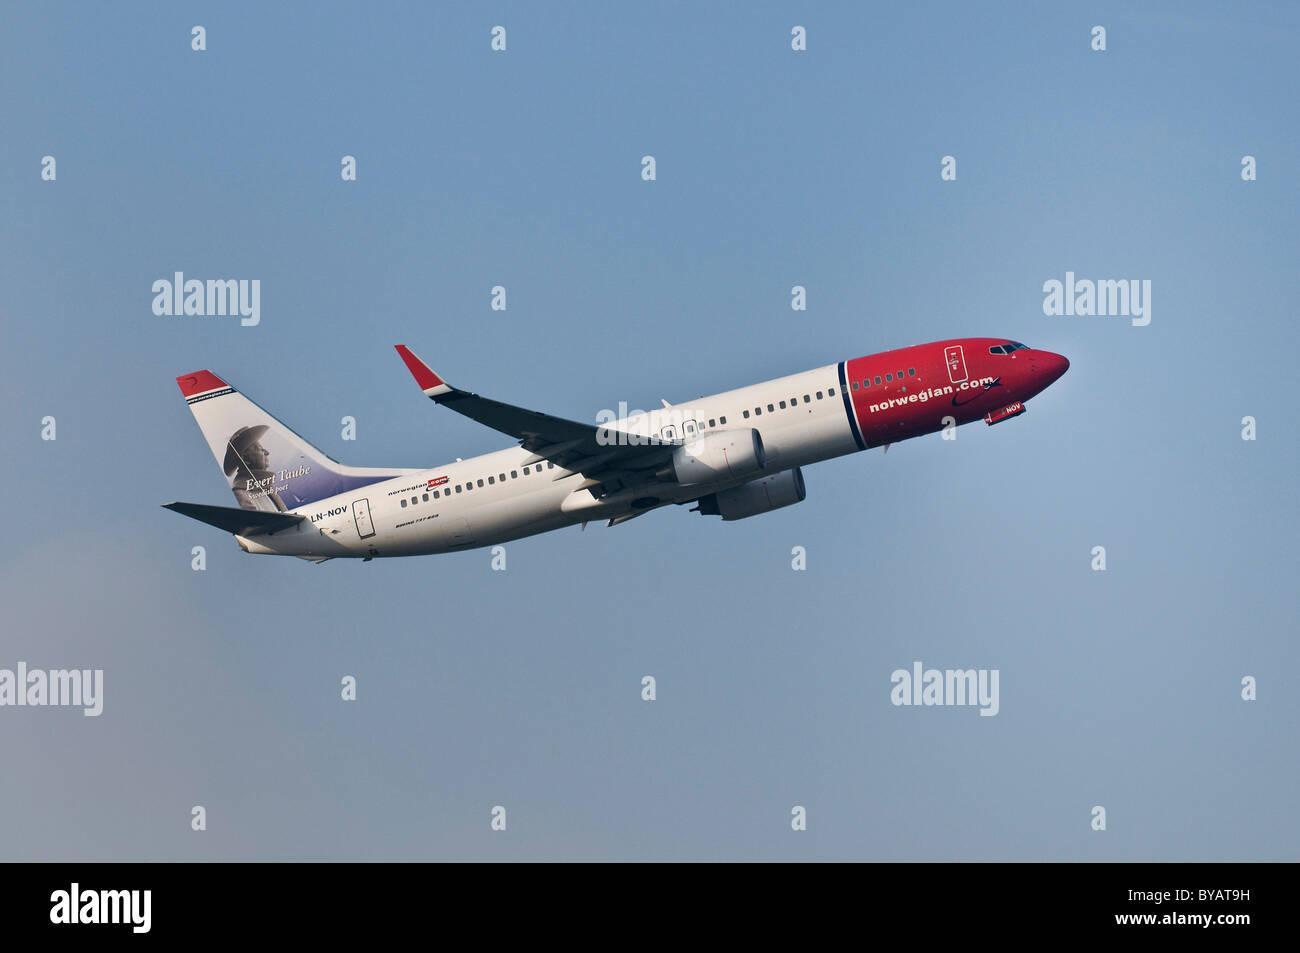 Norwegian Air Shuttle Boeing 737-8FZ, passenger plane climbing - Stock Image